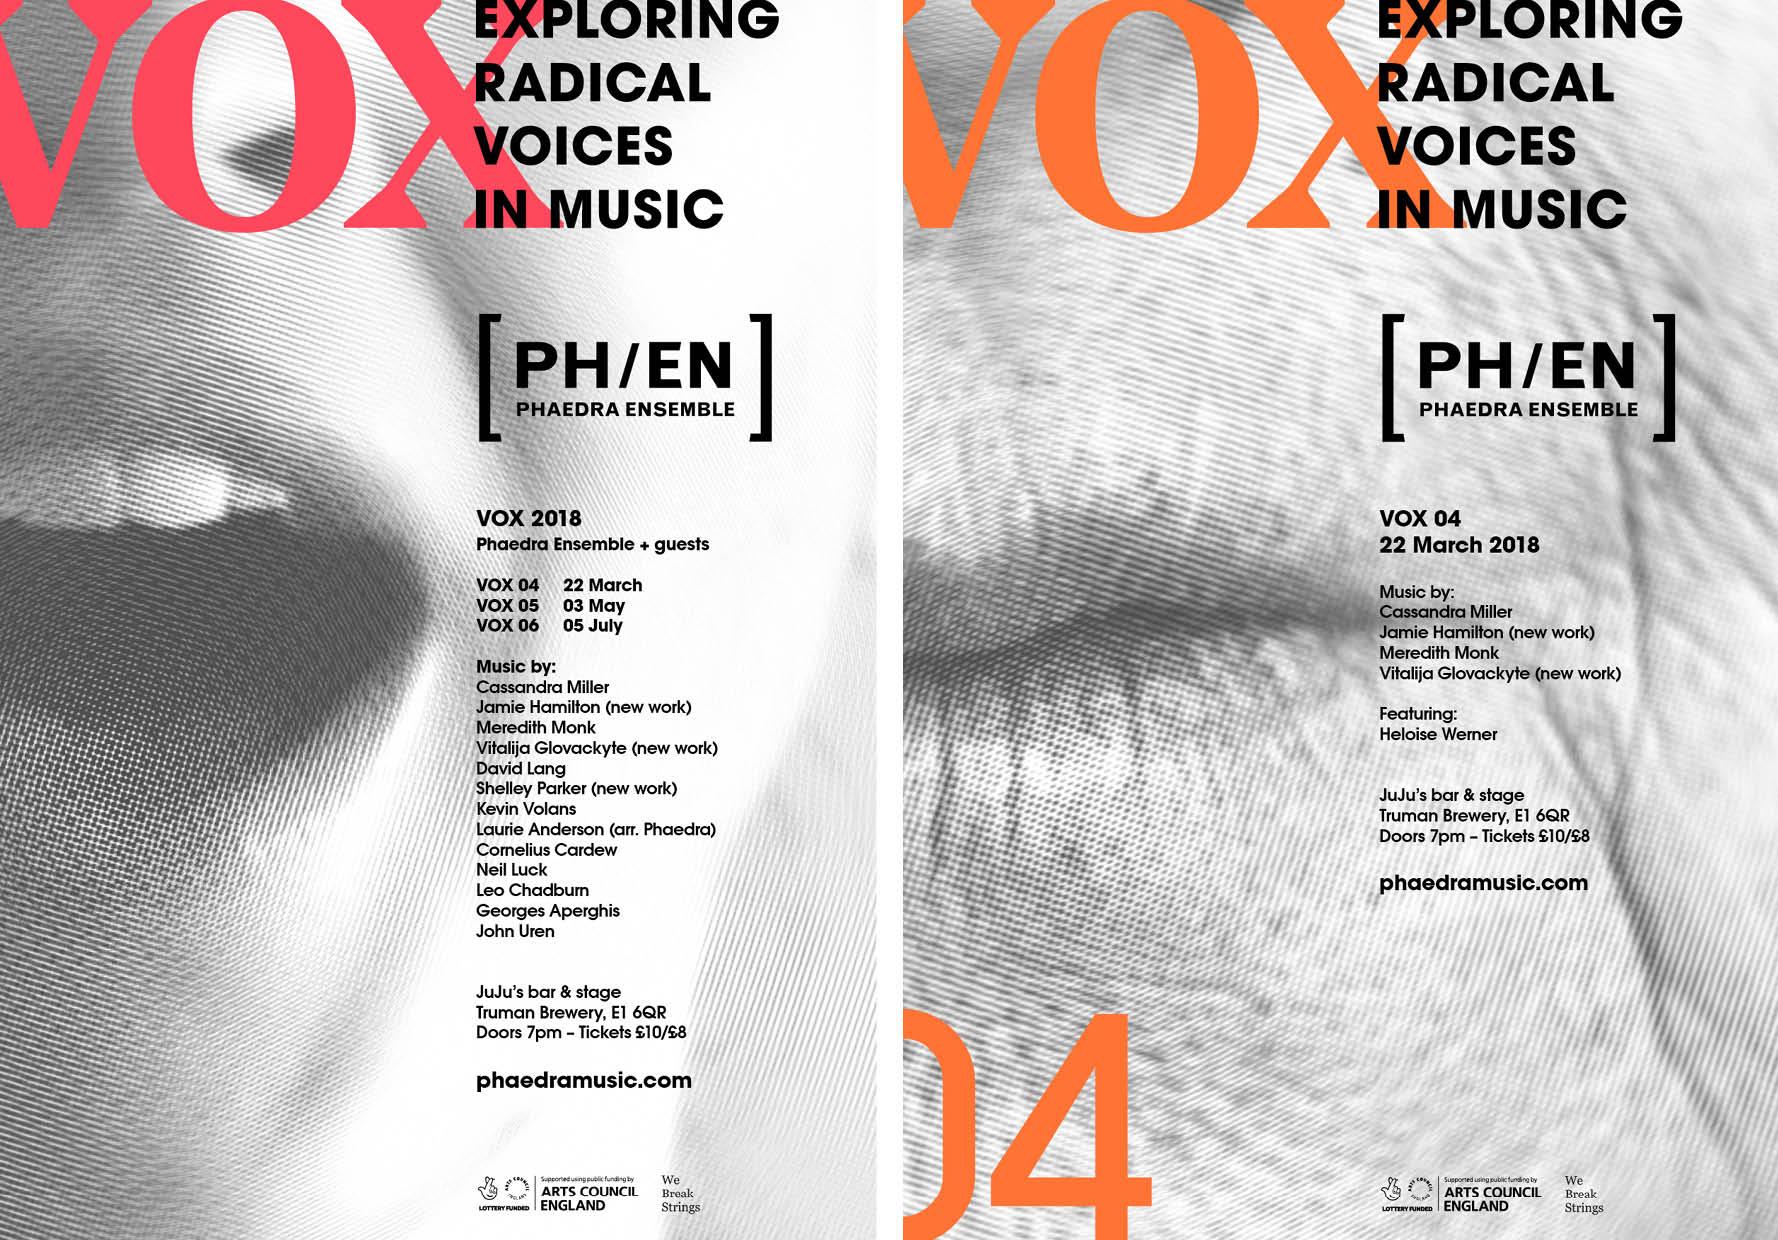 Phaedra Ensemble, Vox 2018